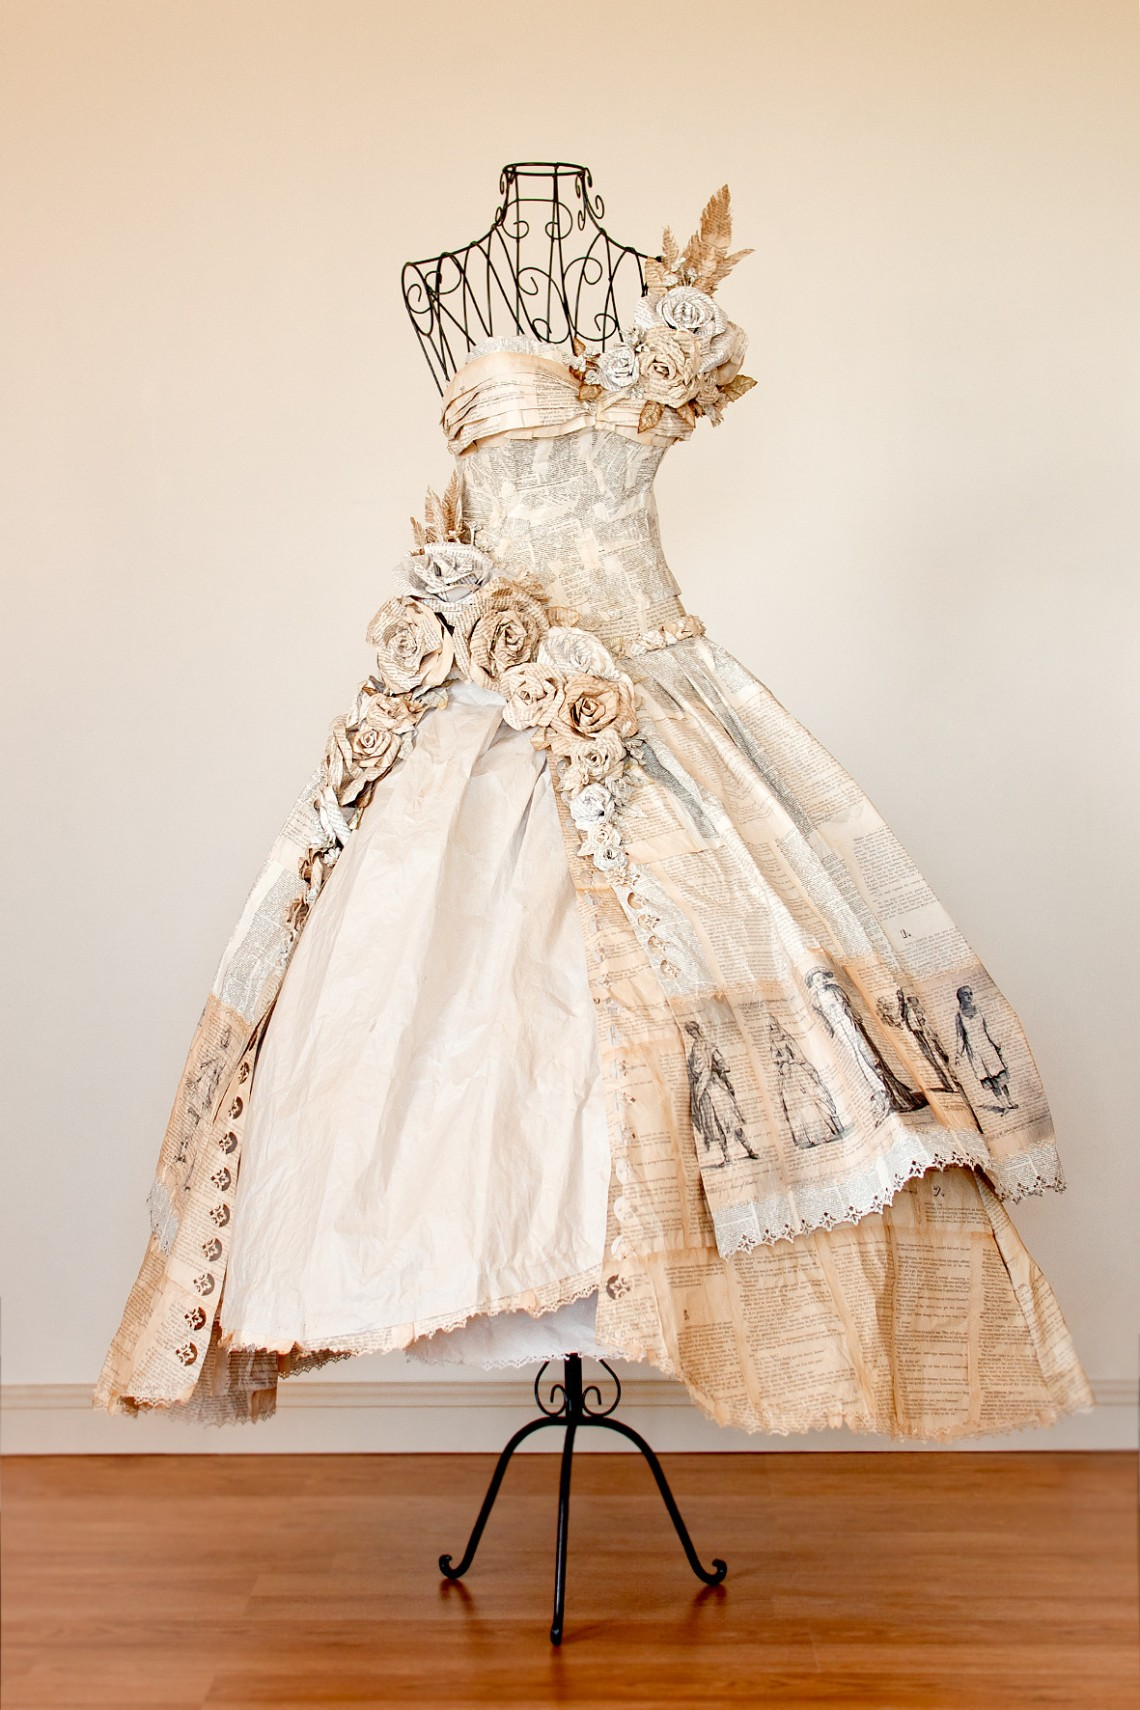 Robe en papier